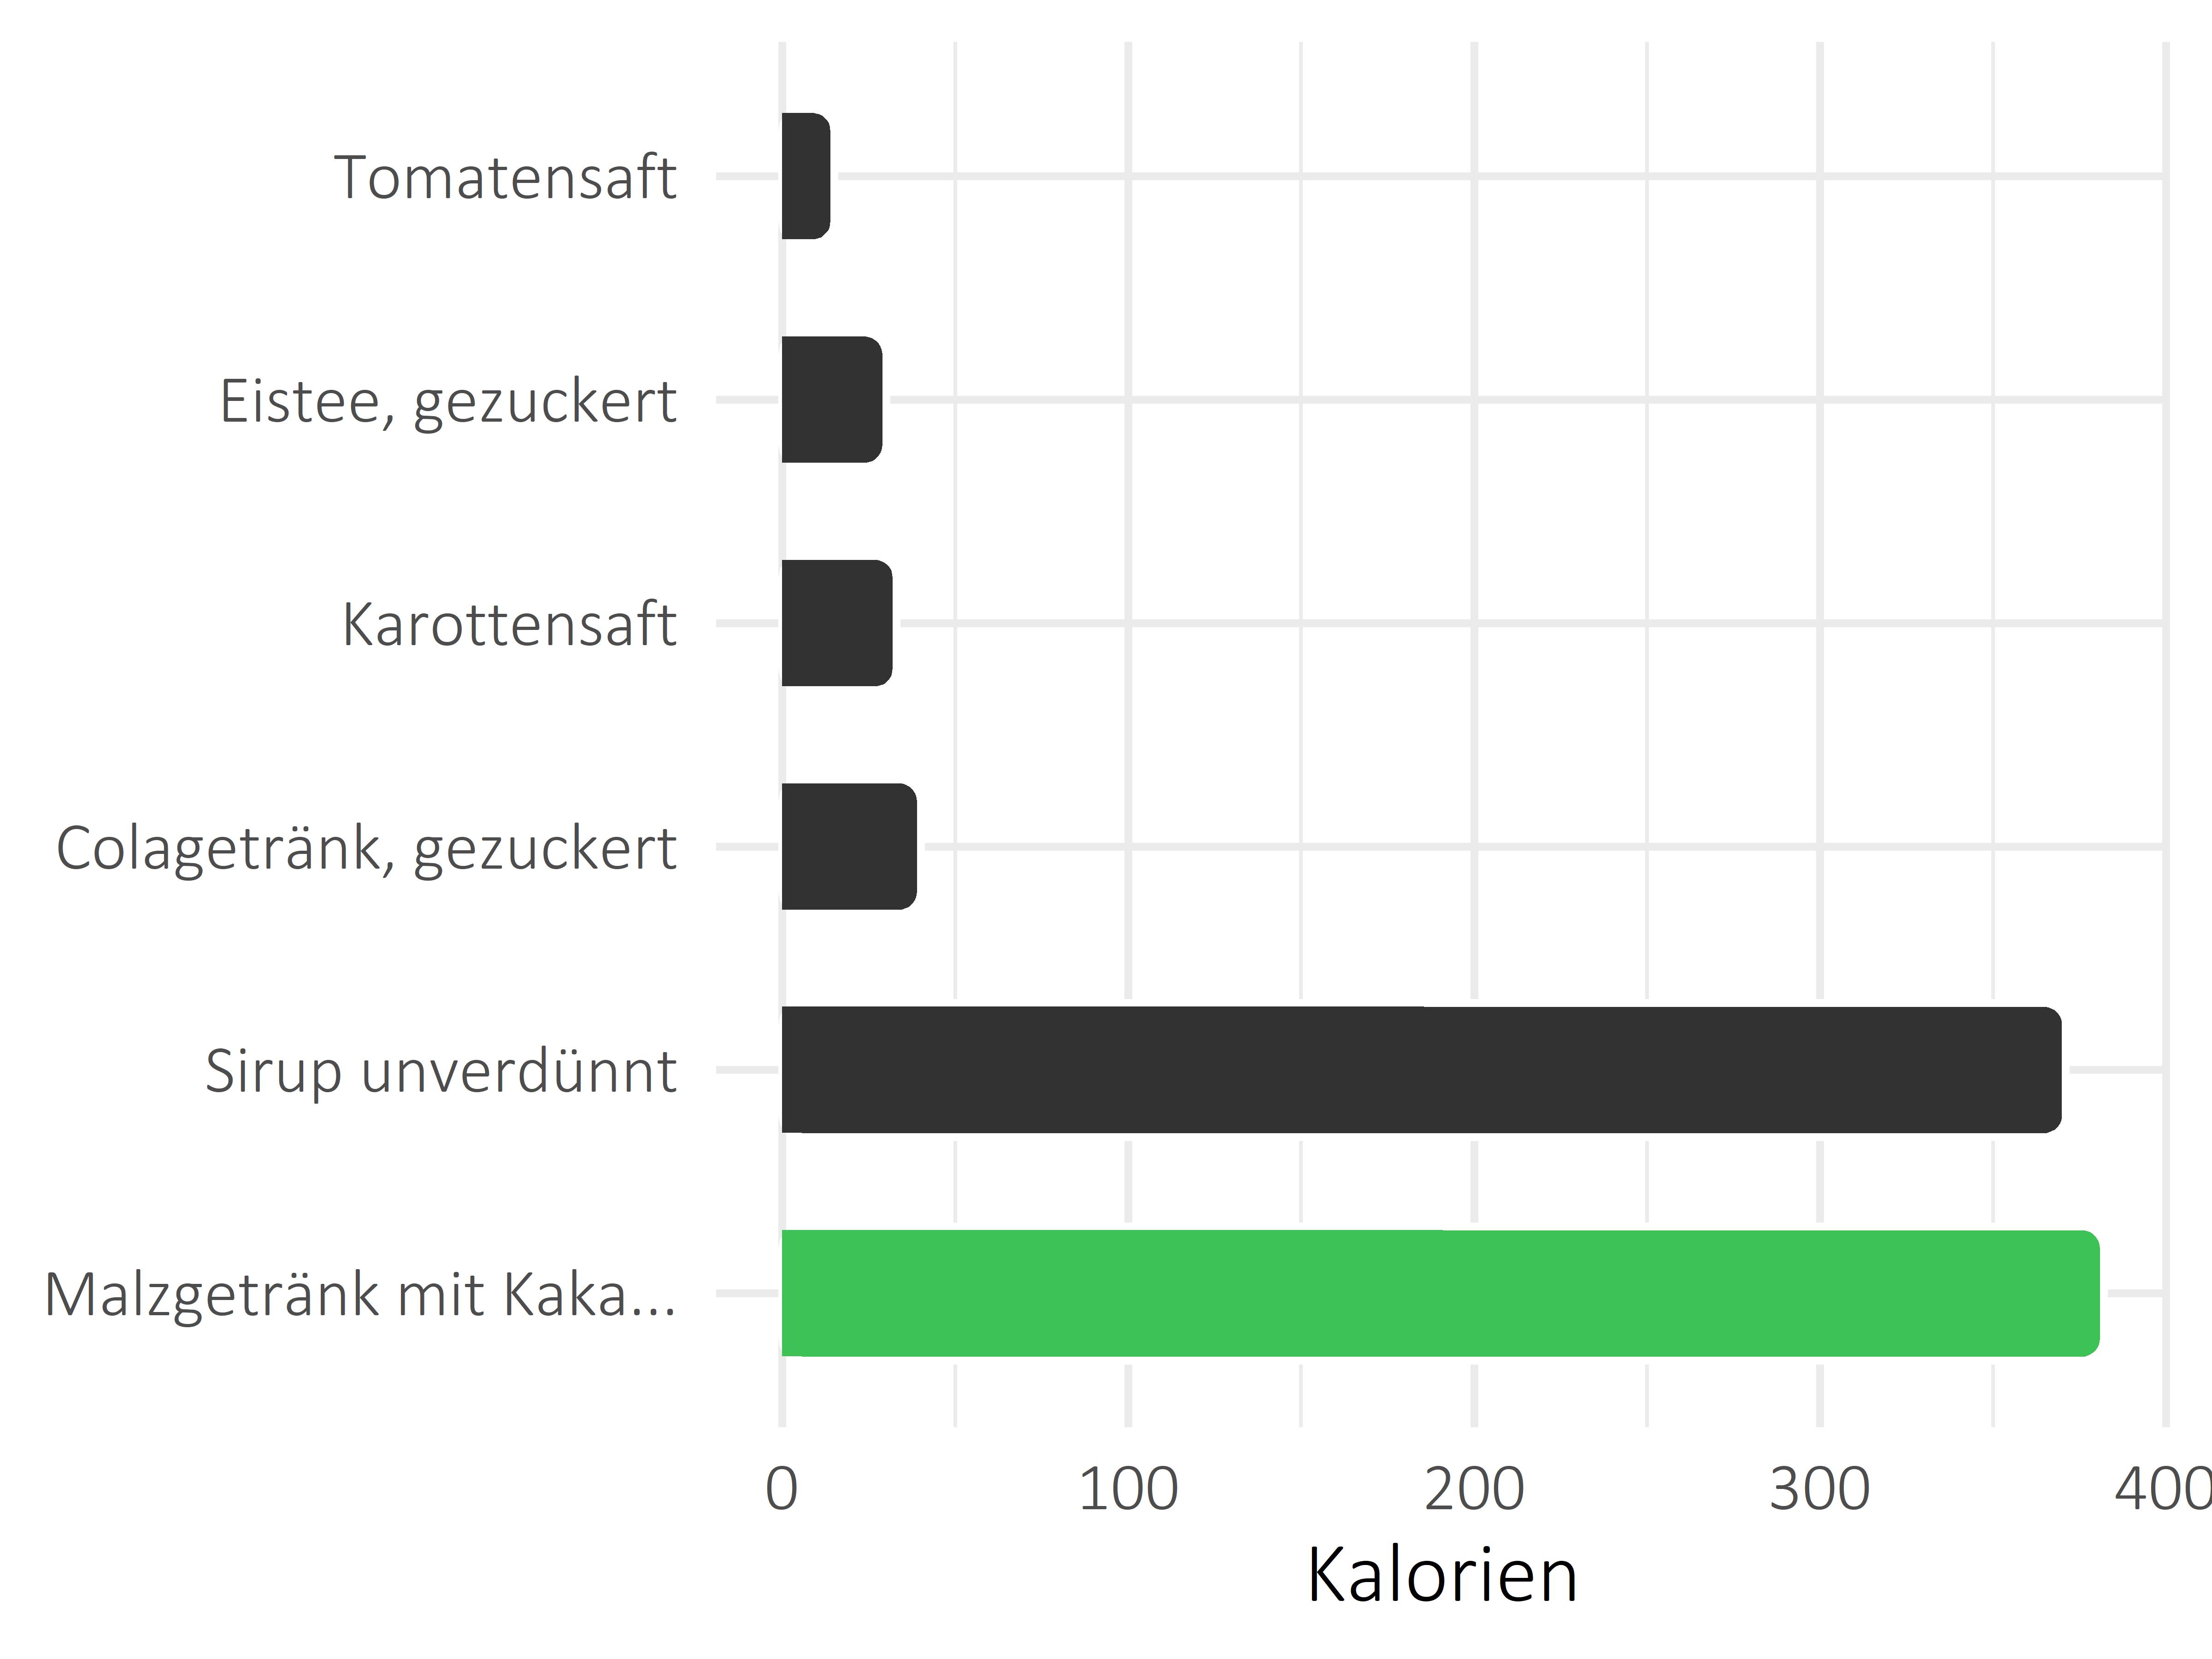 alkoholfreie Getränke Kilokalorien